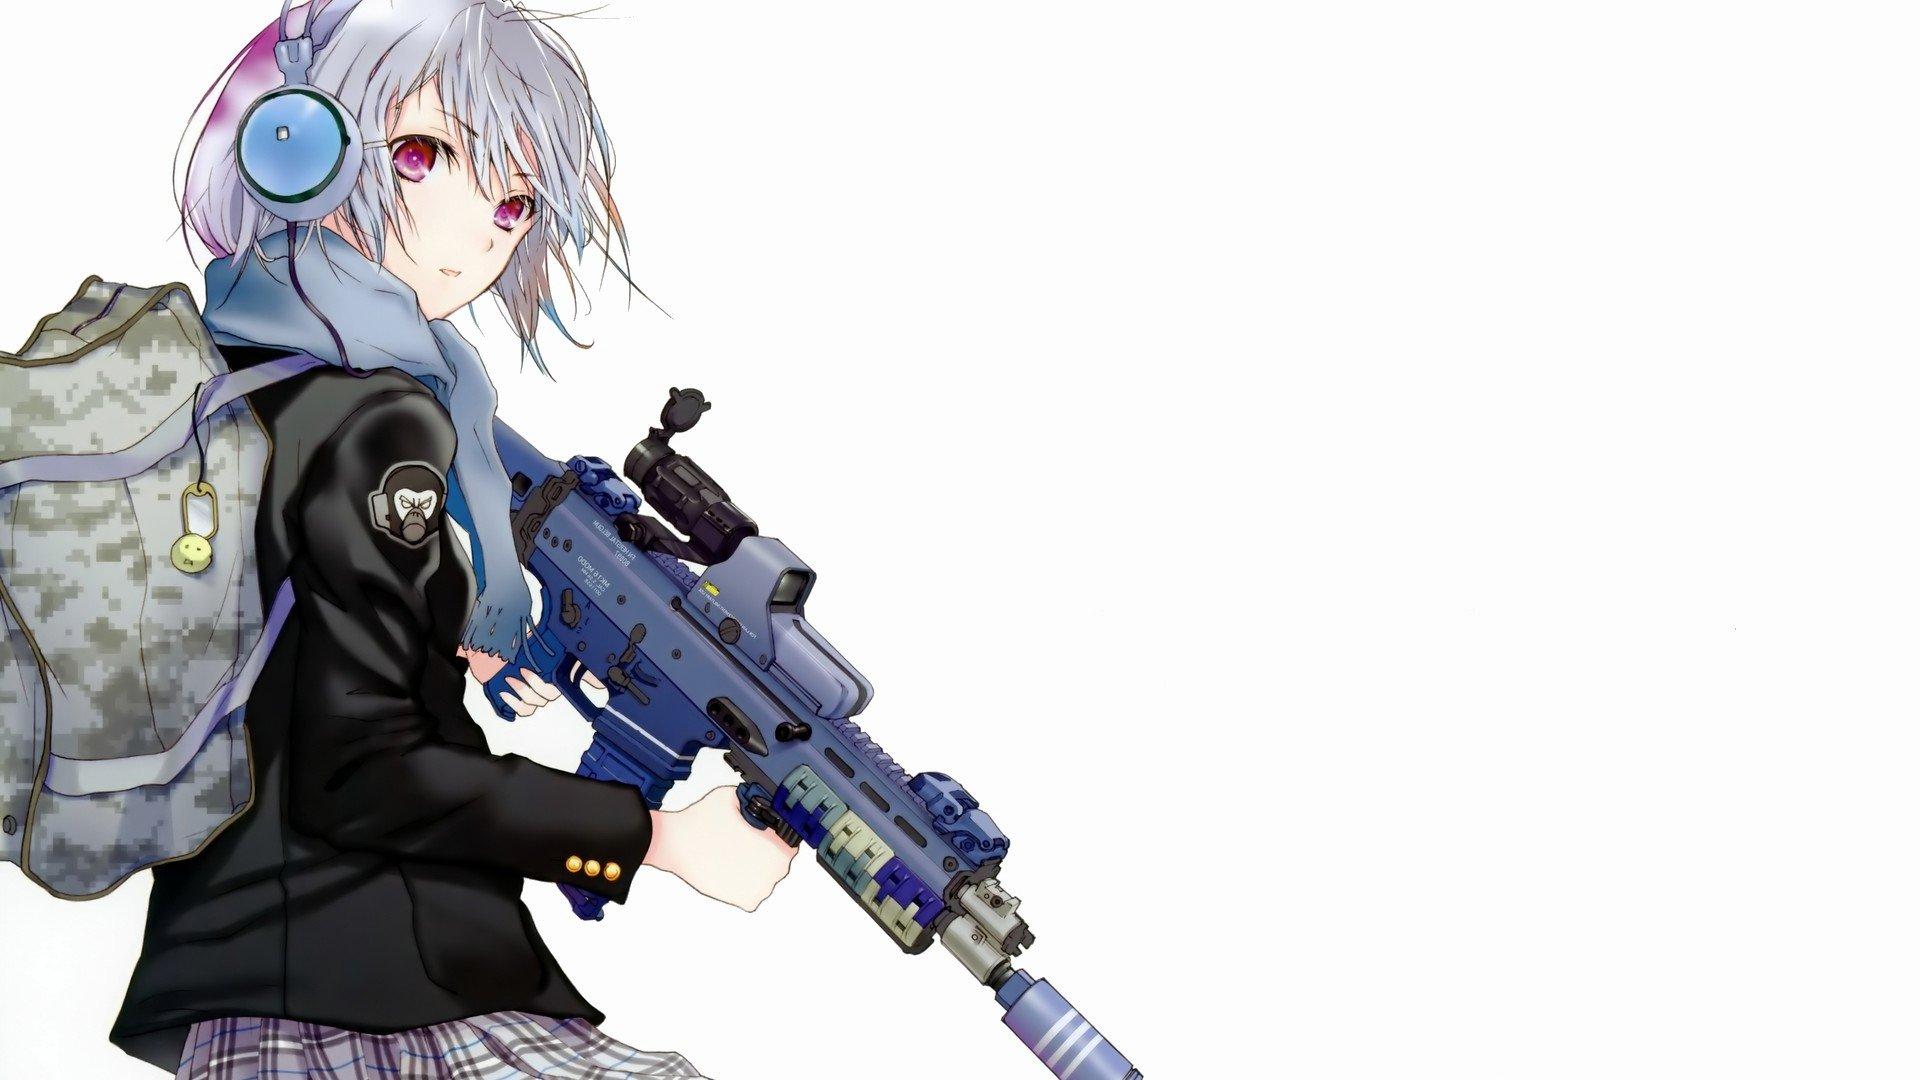 47 Anime Girl Hd Wallpaper 1080p On Wallpapersafari